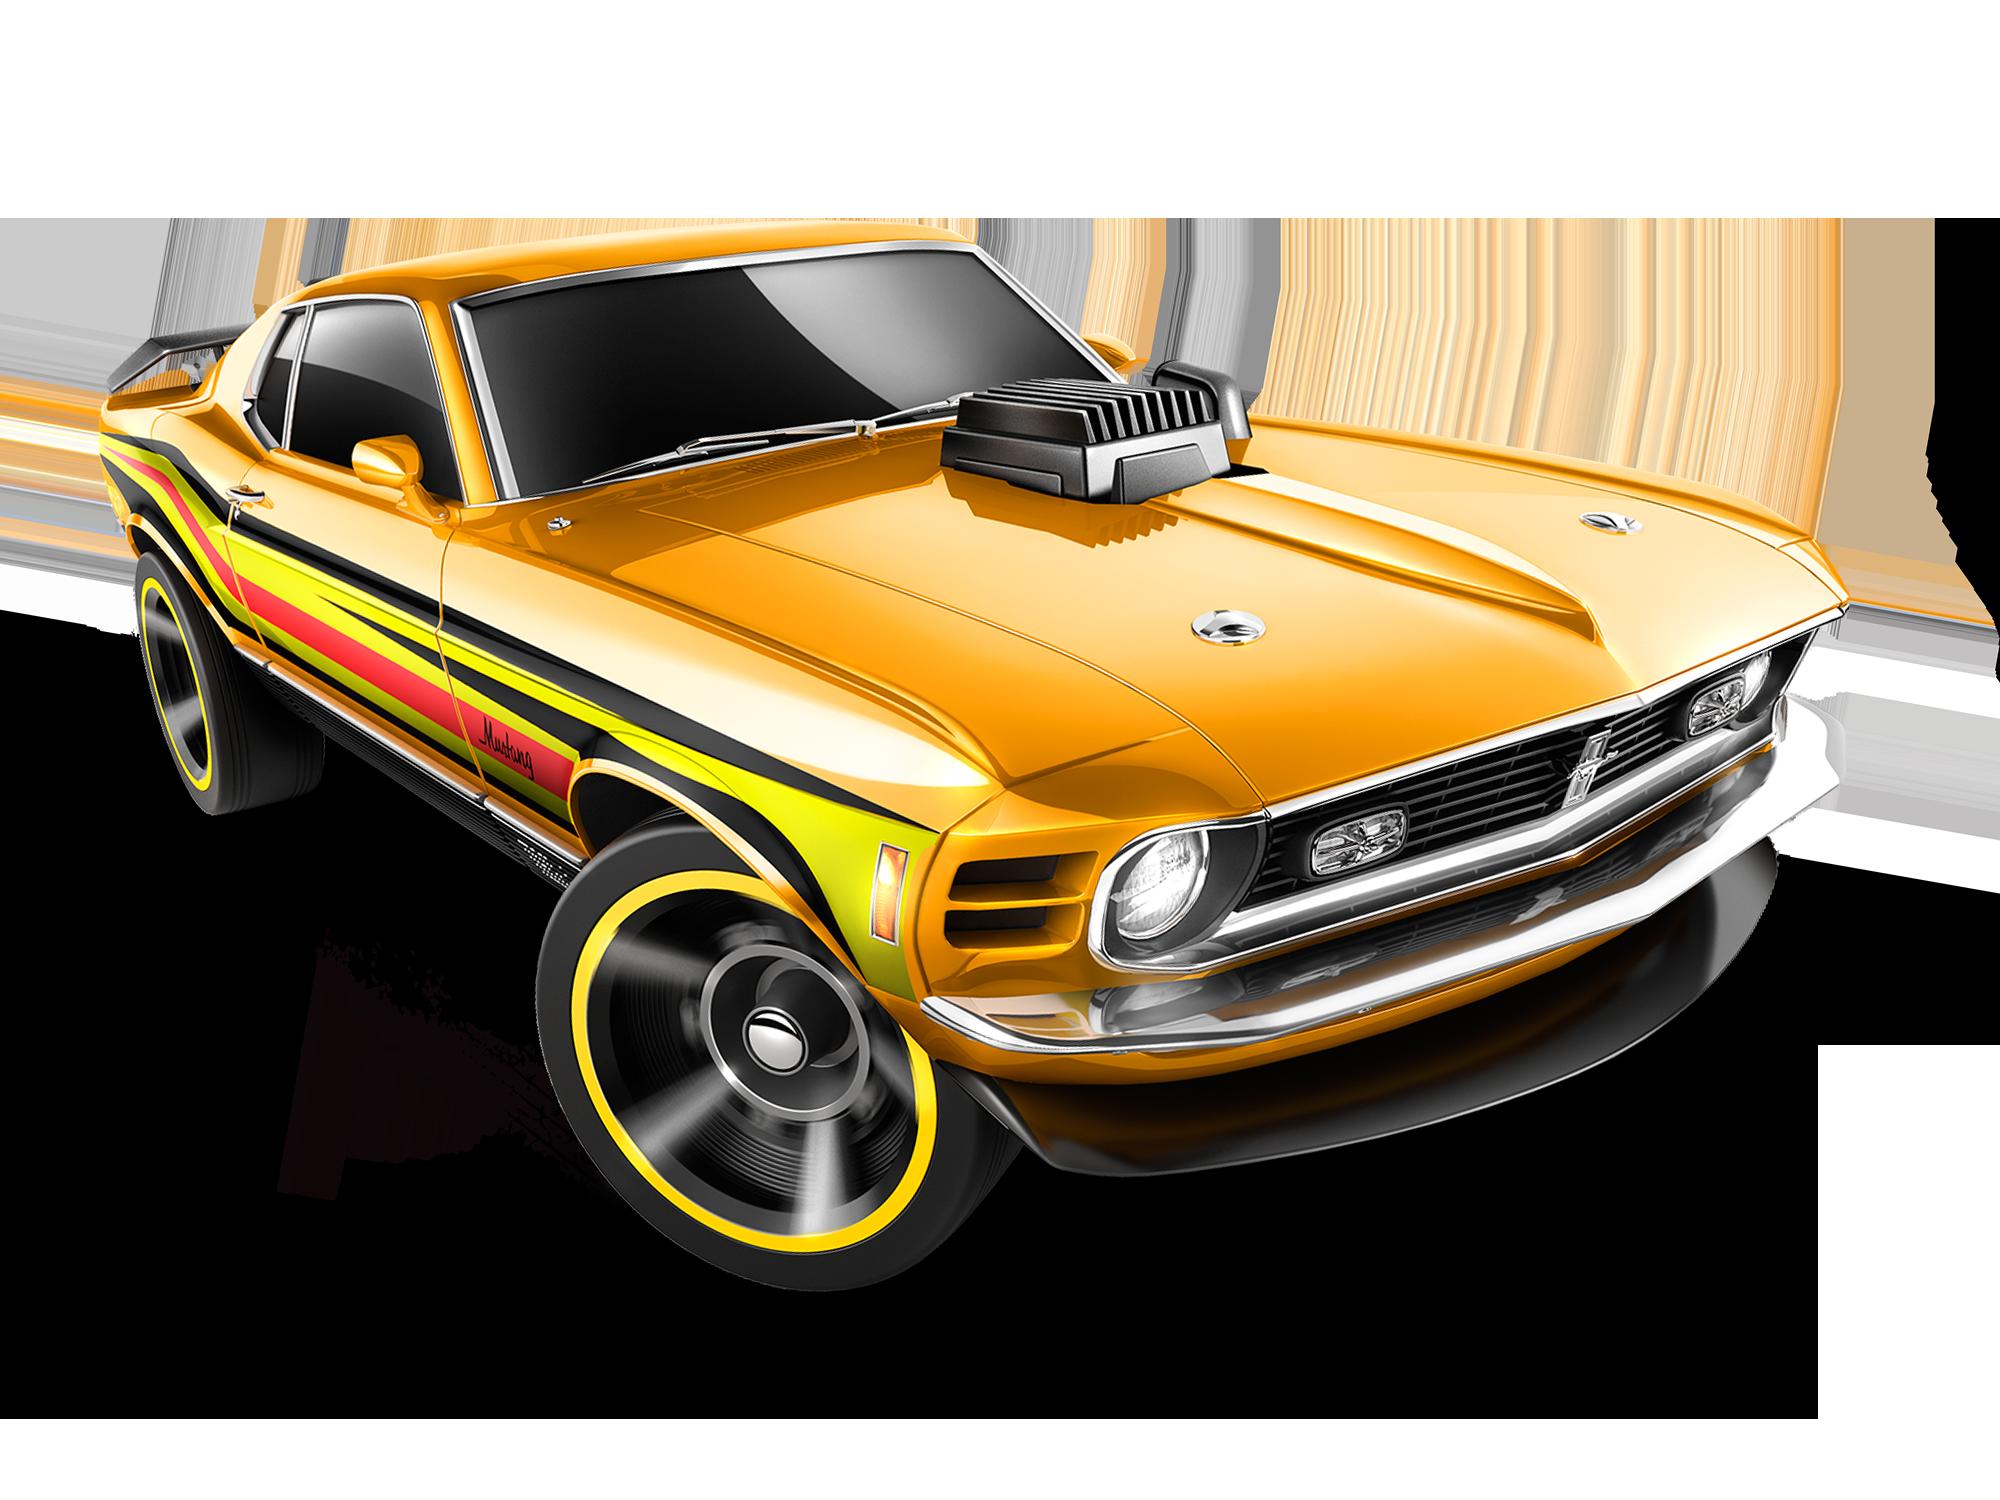 Mattel Hot Wheels Diecast Car 70 Ford Mustang Mach 1 2014 Yellow Ford Mustang Carros Hot Wheels Lavagens De Carro